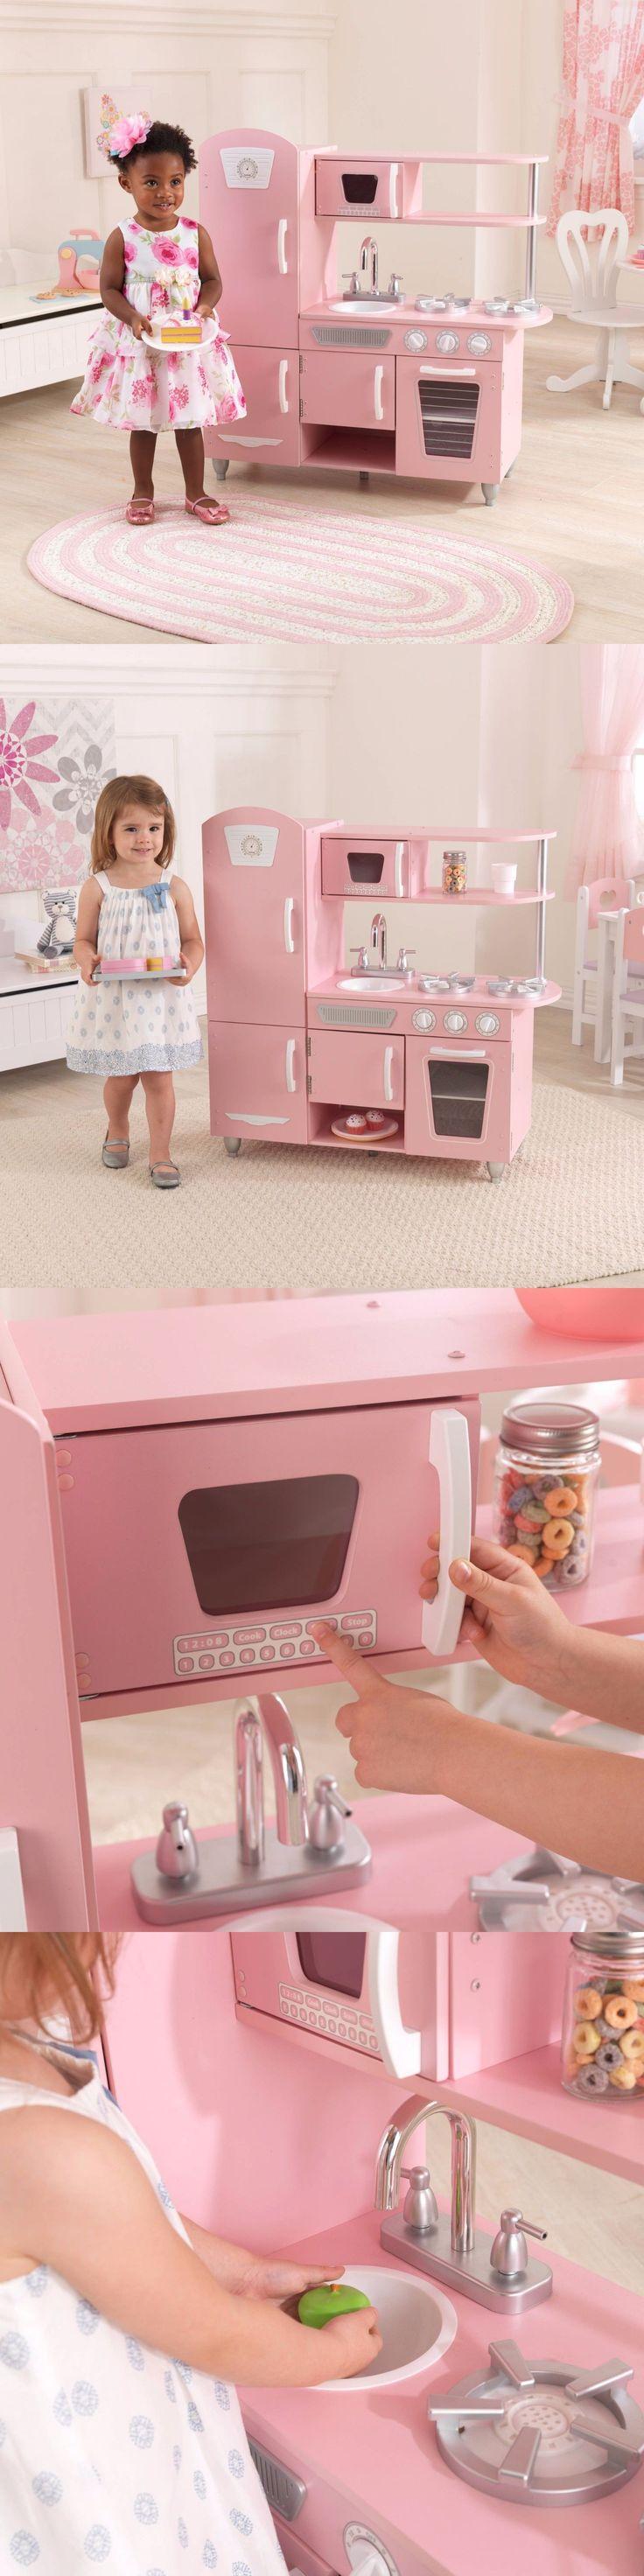 best 20 kidkraft kitchen set ideas on pinterest no signup